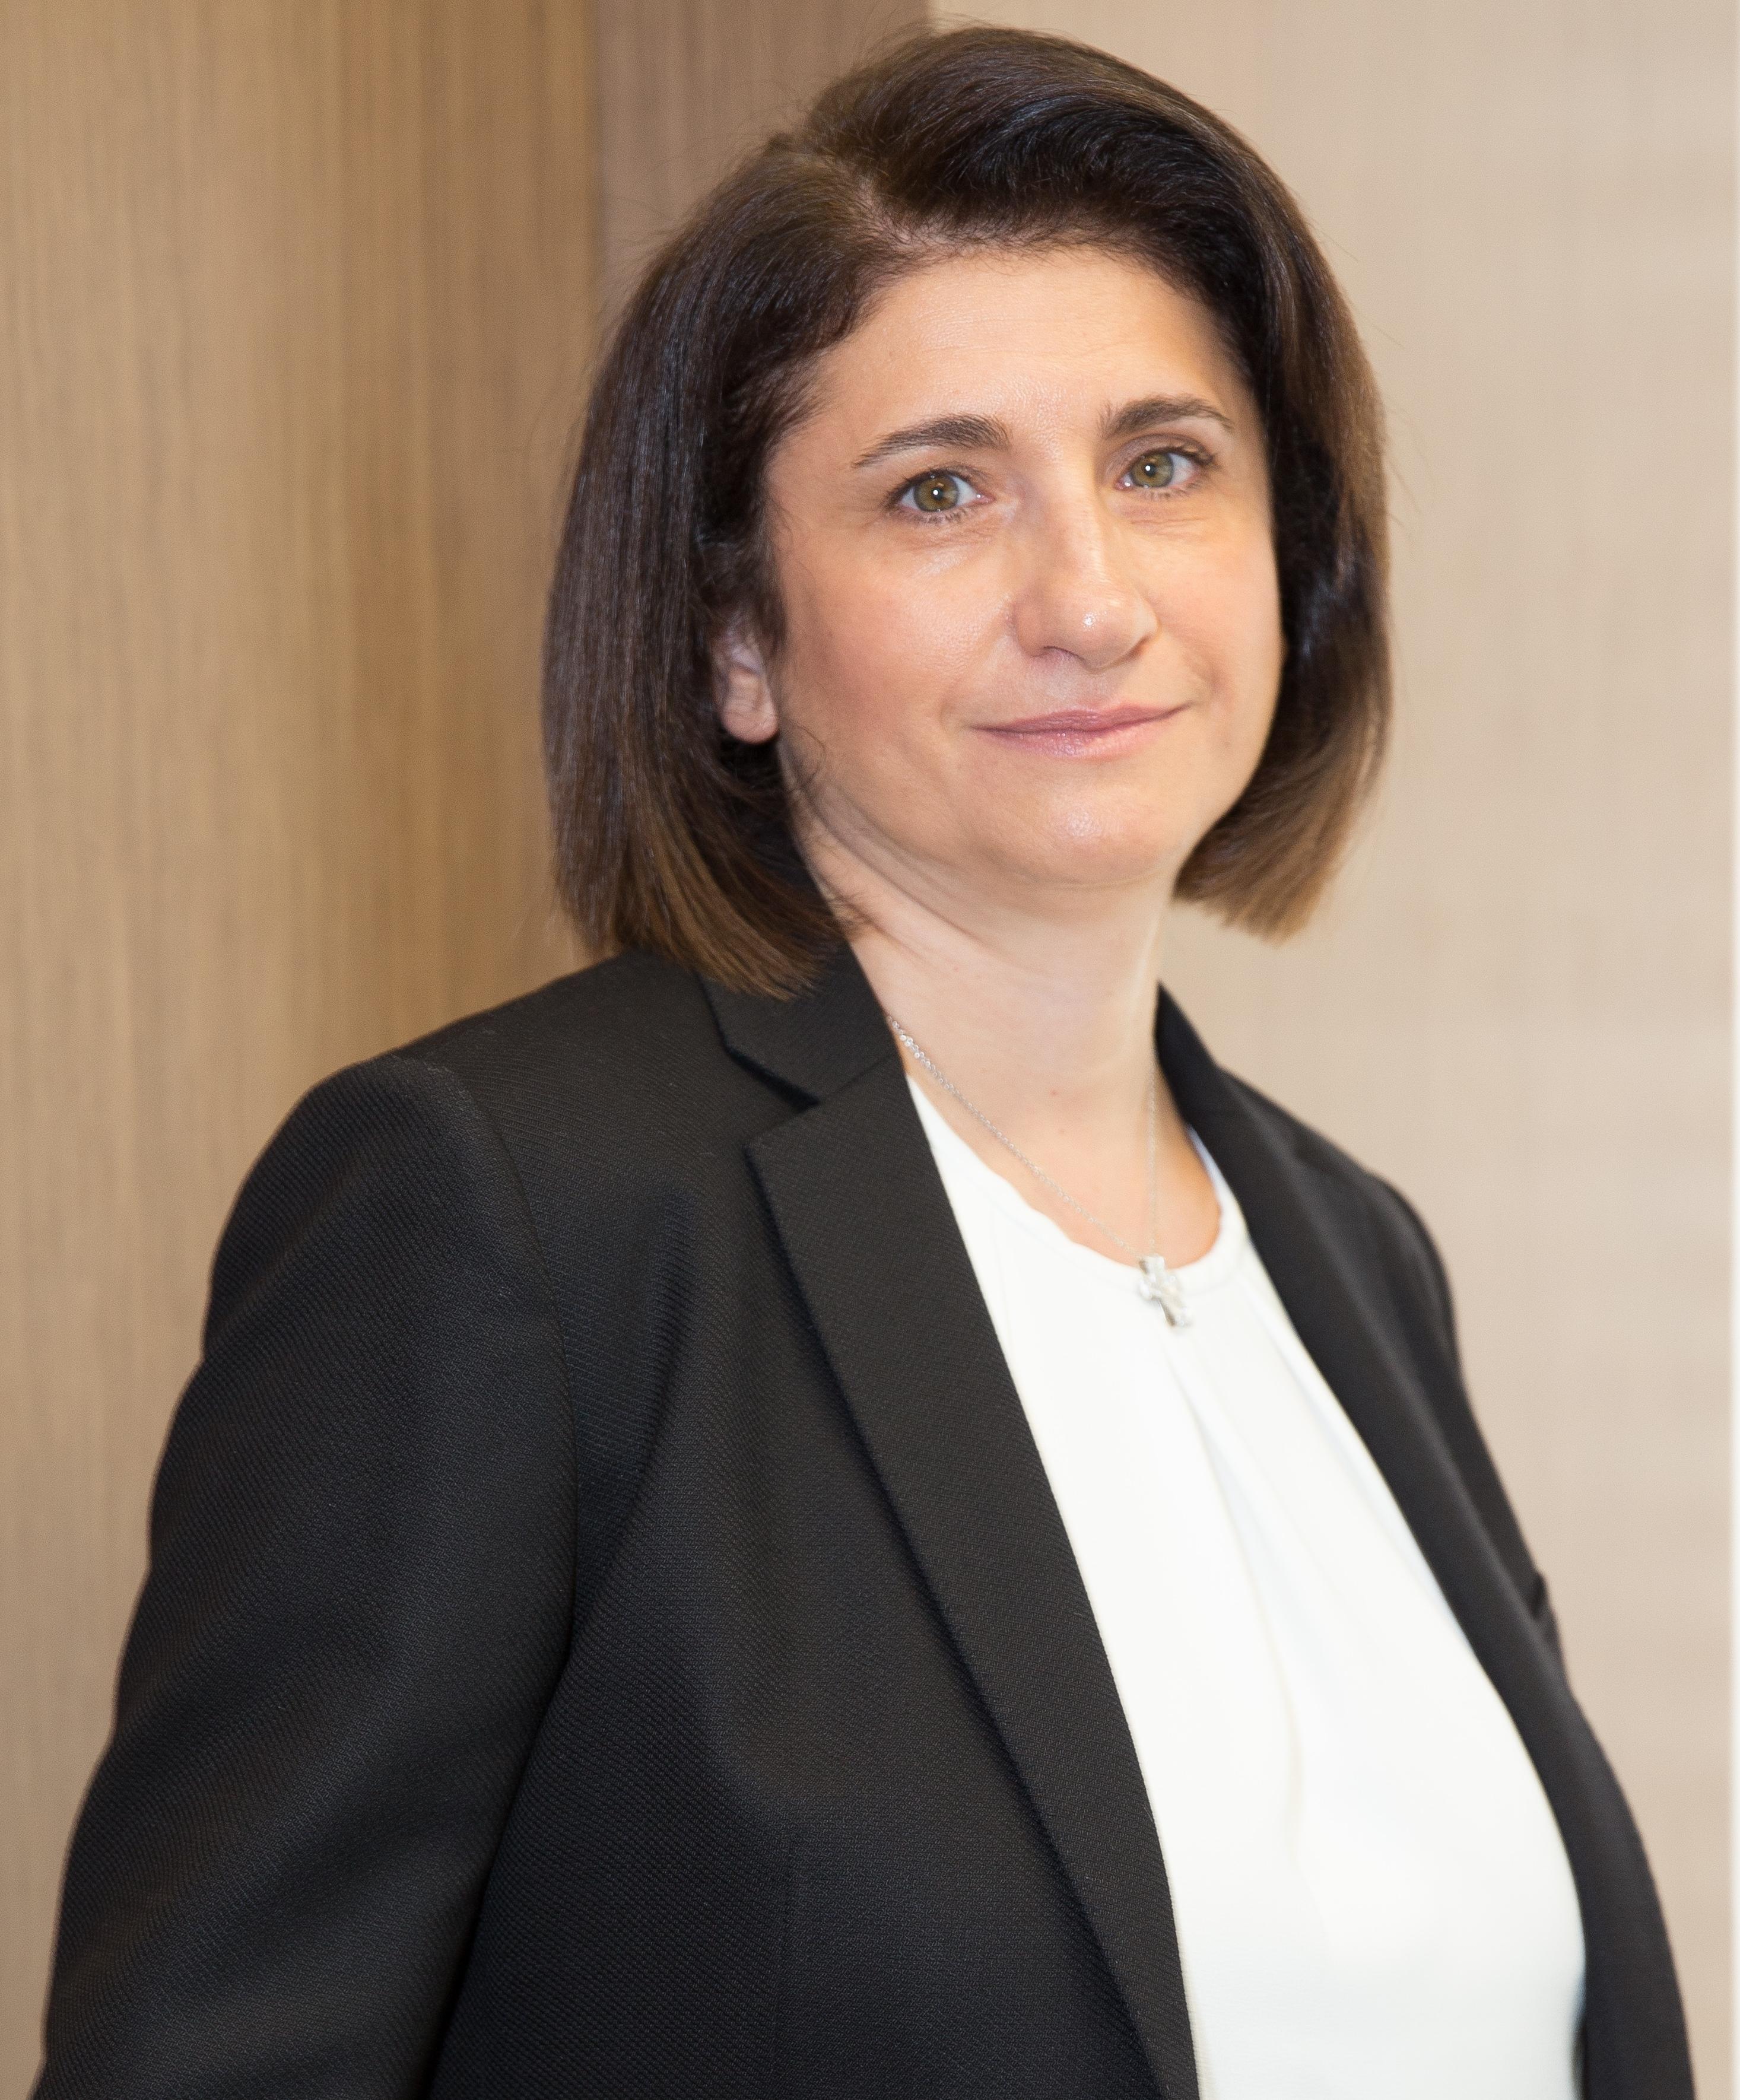 Elena Malekou